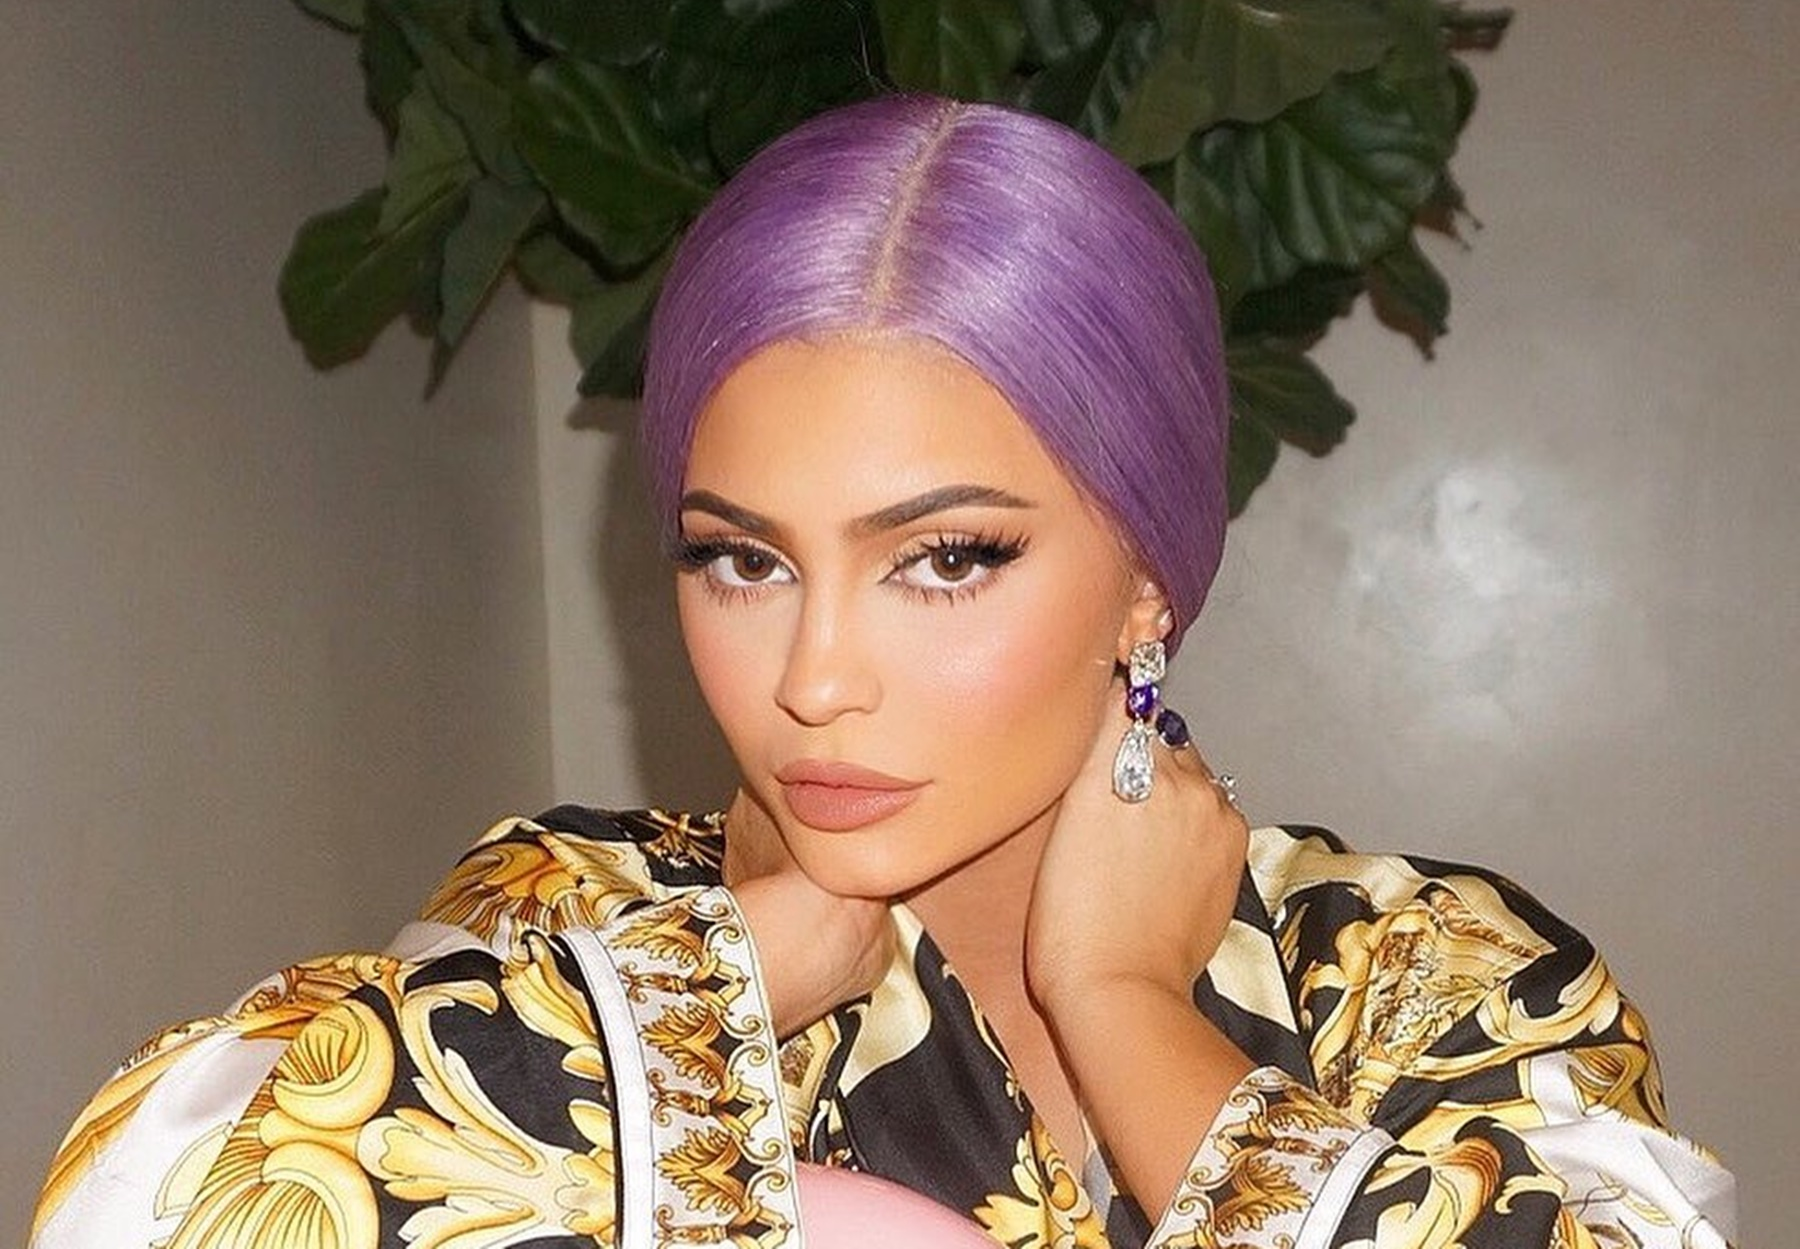 Kylie Jenner Rihanna Skin Care Line